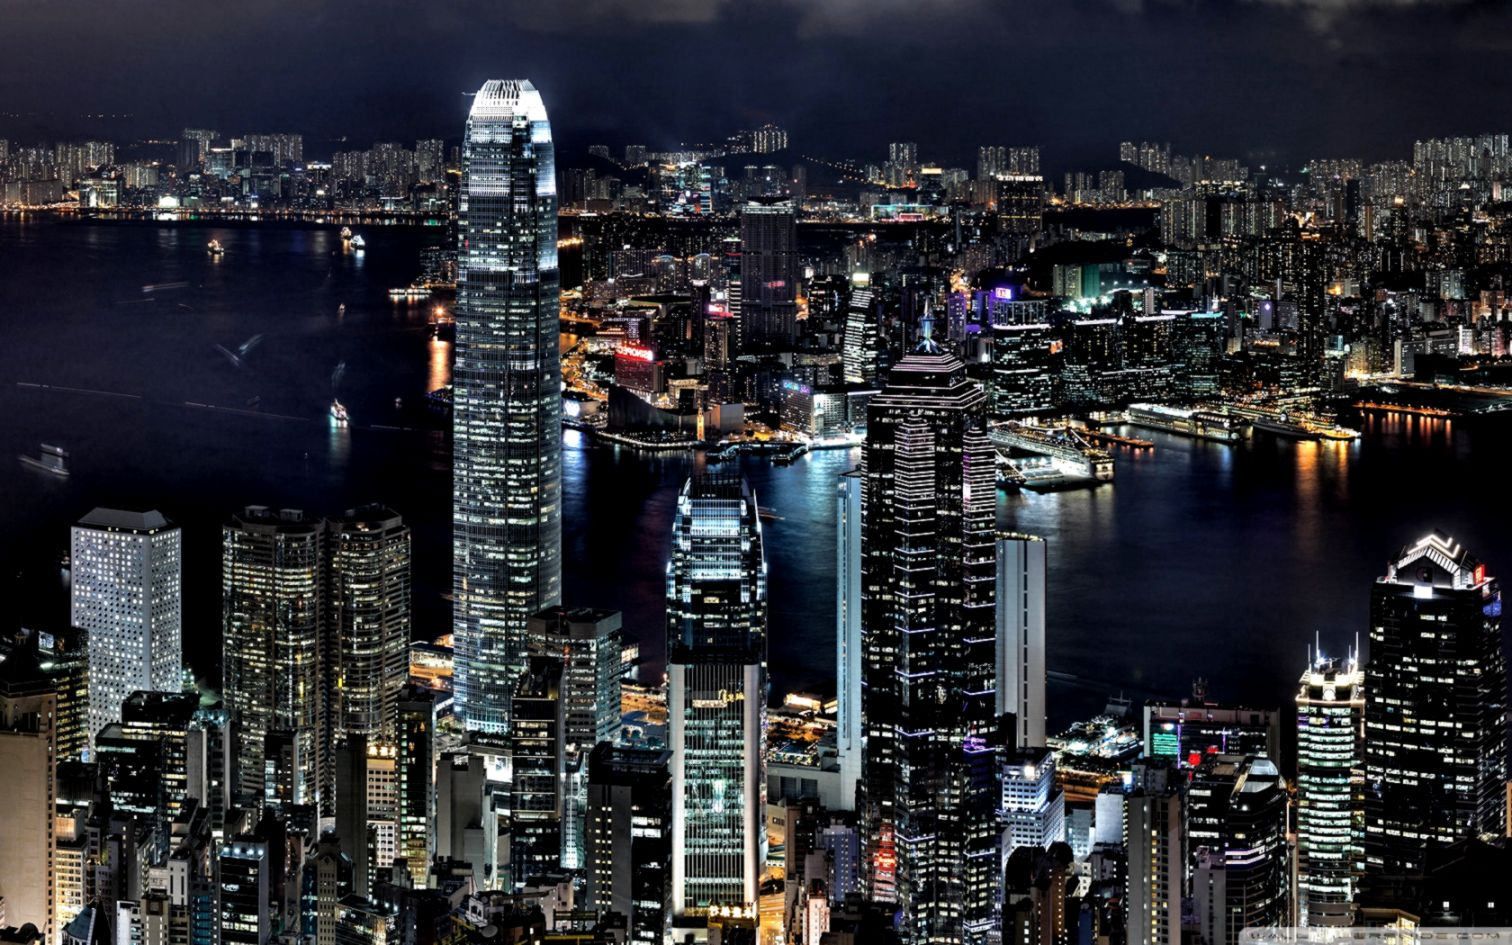 Hd Hongkong Wallpaper Mobile Wallpapers